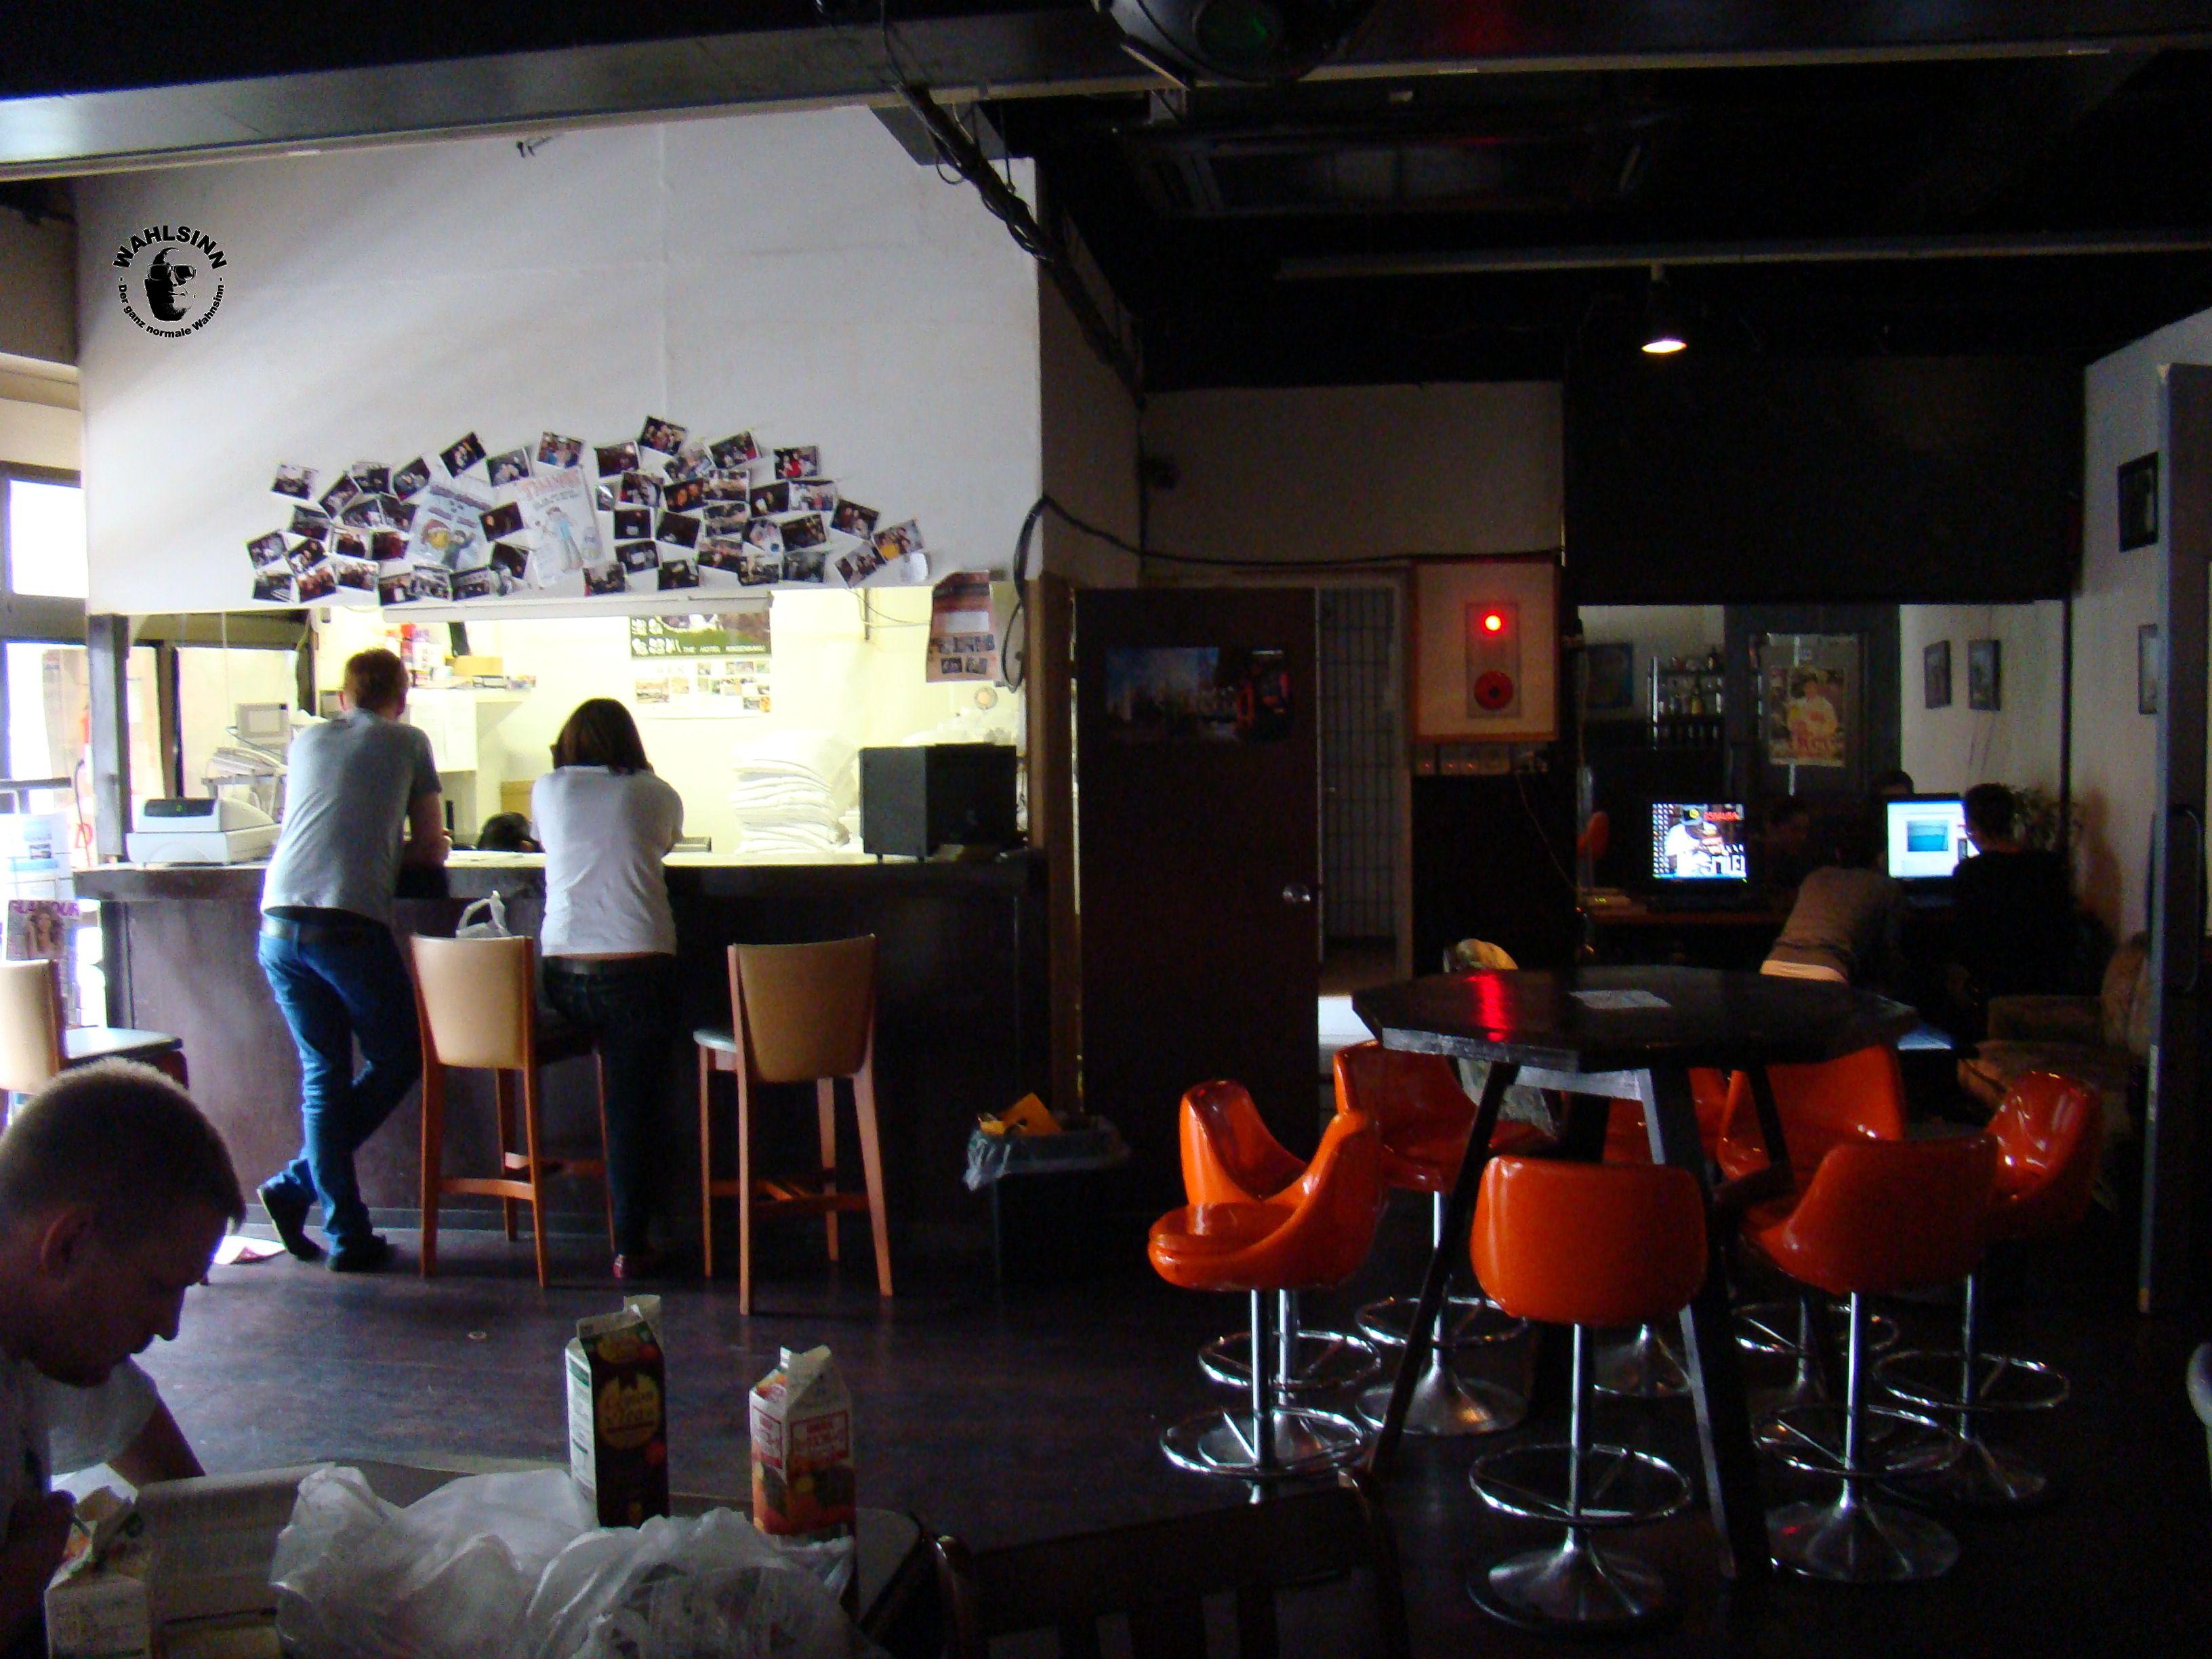 Japan // Tokio - Asakusa Smile Hostel: Der Aufenthaltsraum